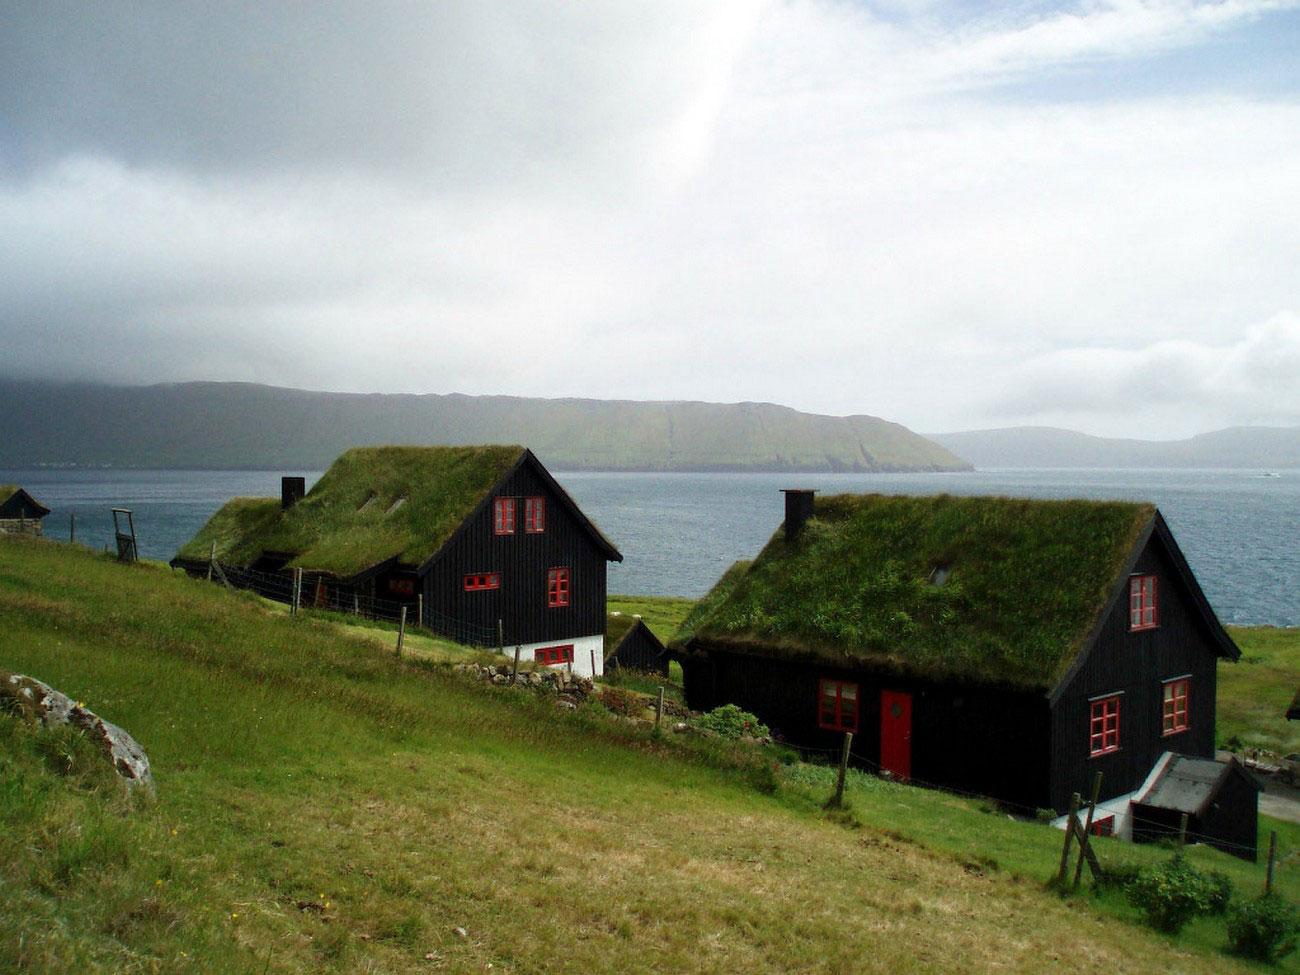 фото домов в деревне